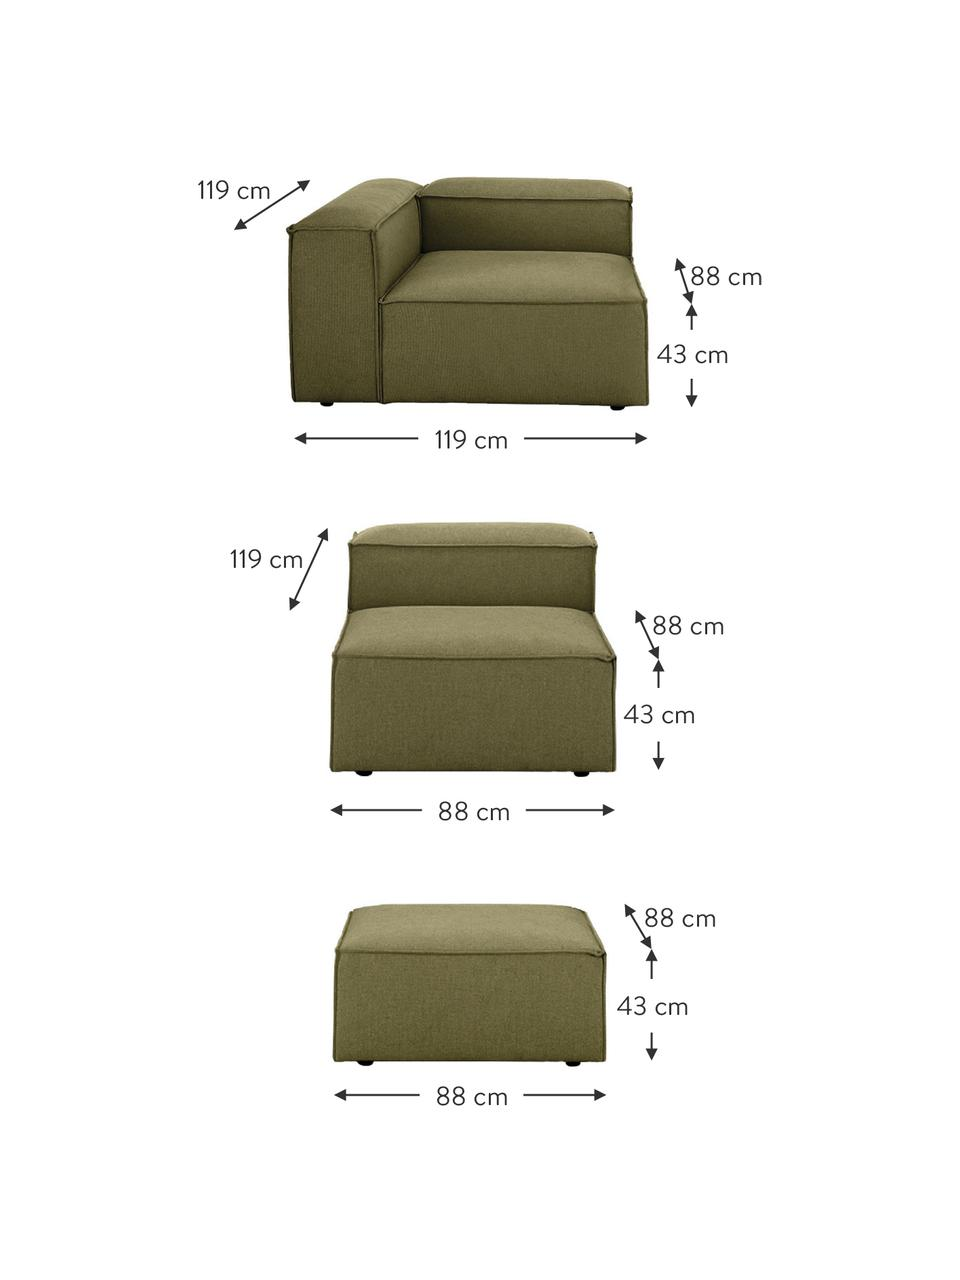 Modulaire hoekbank Lennon in groen, Bekleding: polyester De hoogwaardige, Frame: massief grenenhout, multi, Poten: kunststof De poten bevind, Geweven stof groen, B 327 x D 207 cm